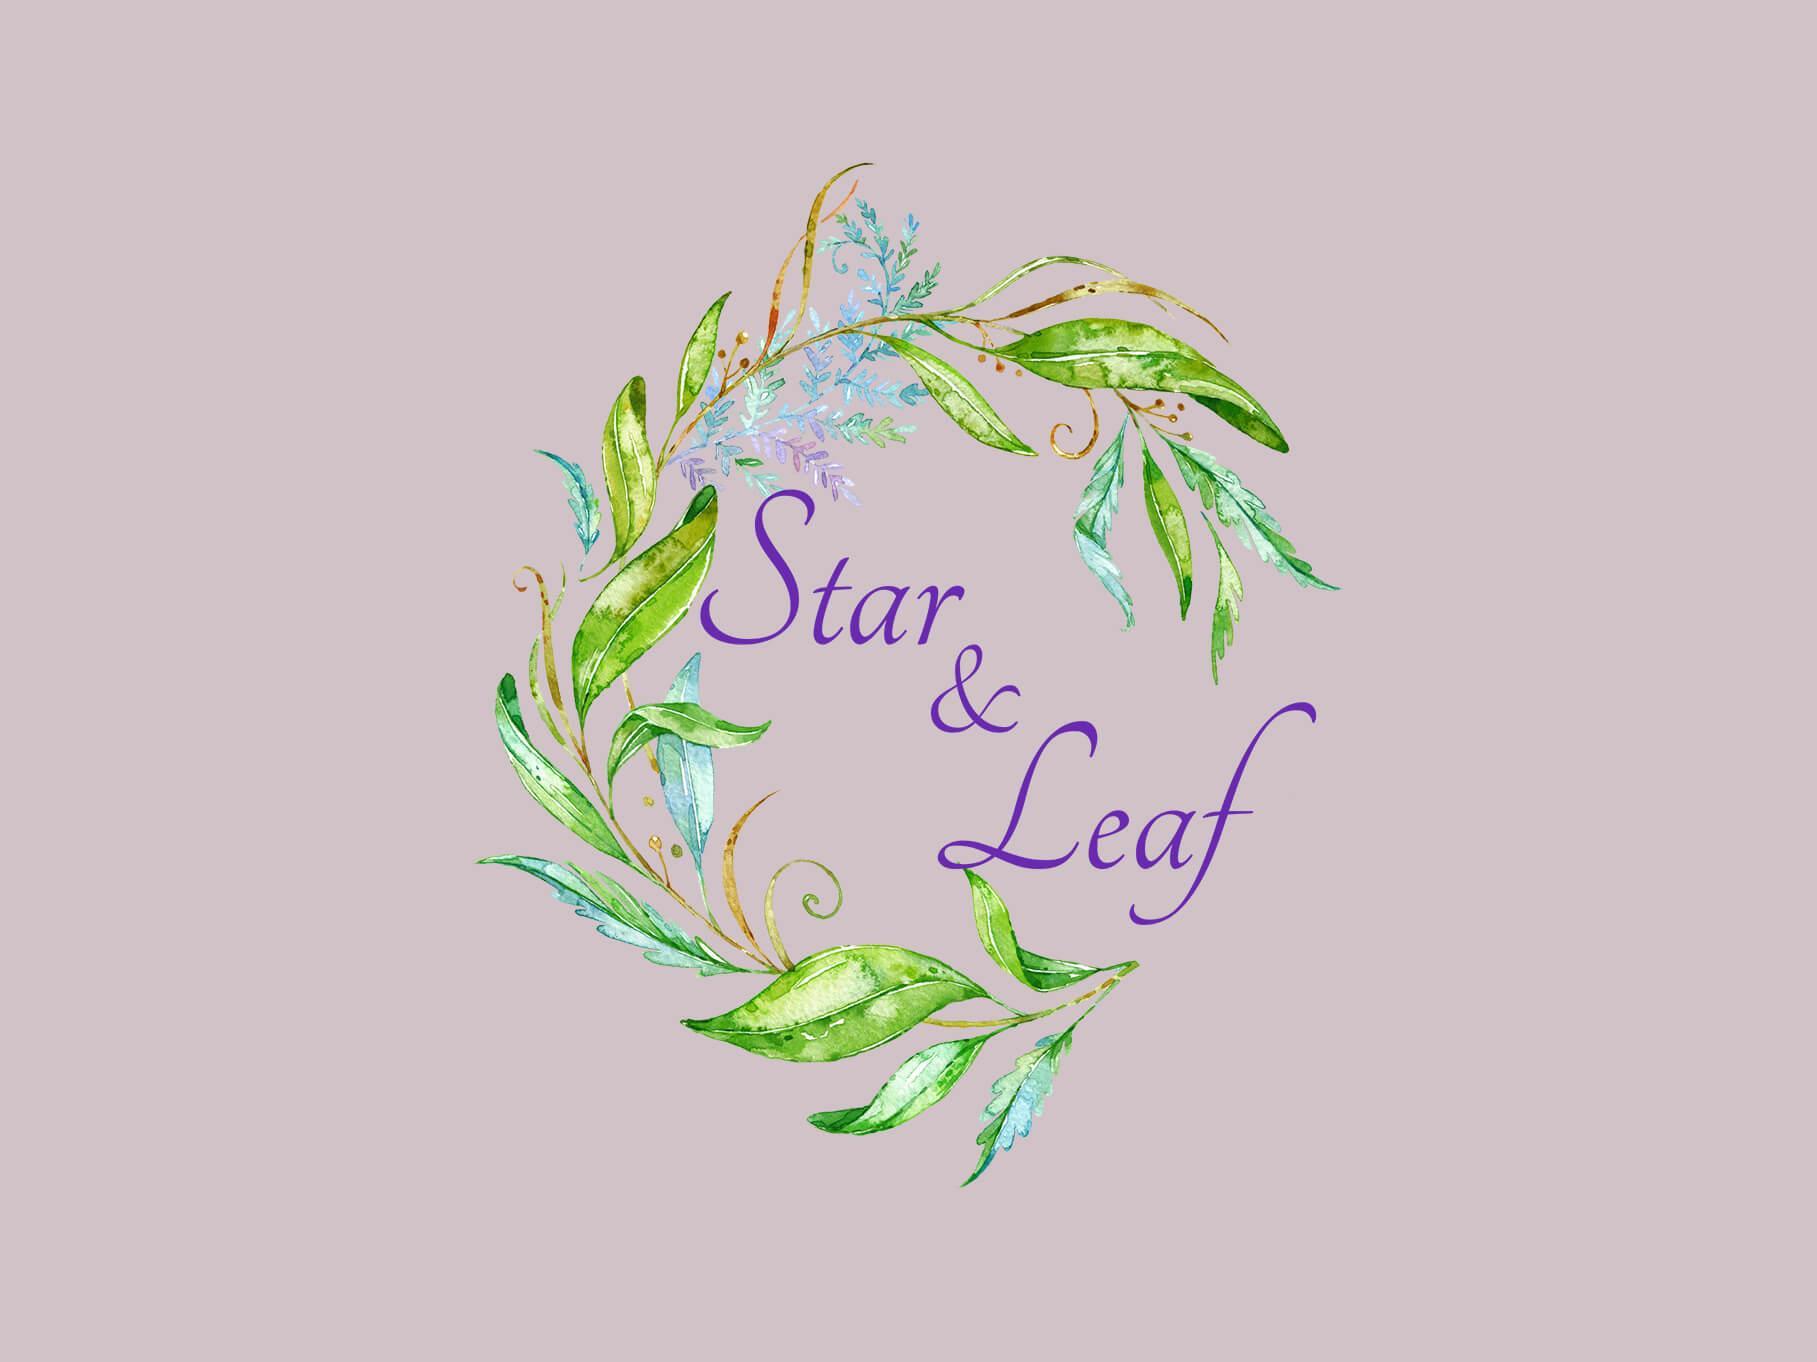 star and leaf veils logo